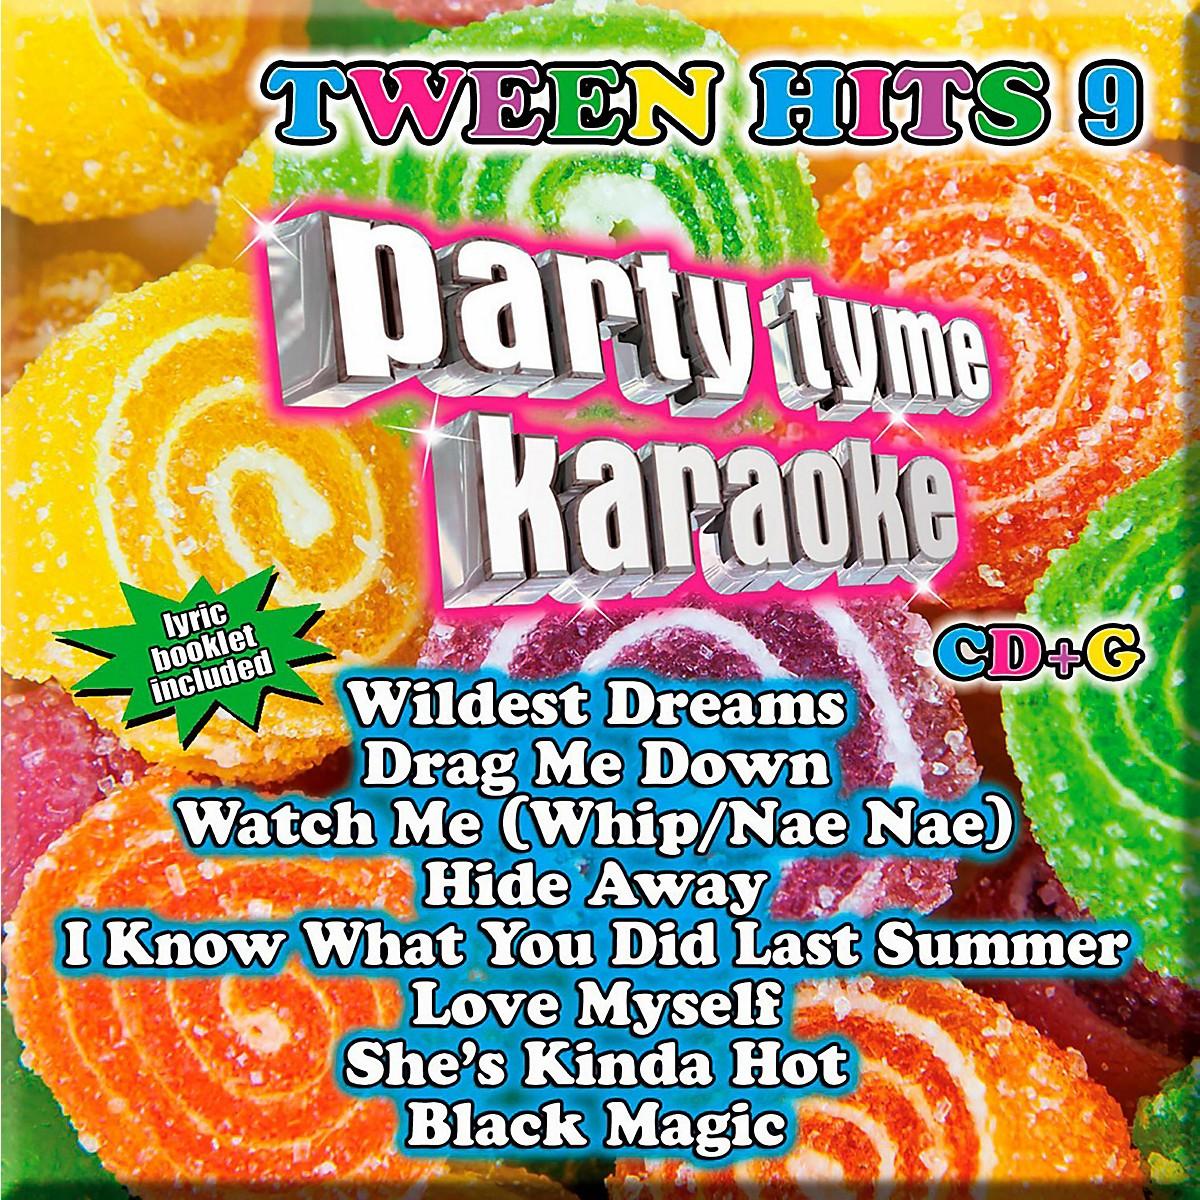 Sybersound Party Tyme Karaoke - Tween Hits 9